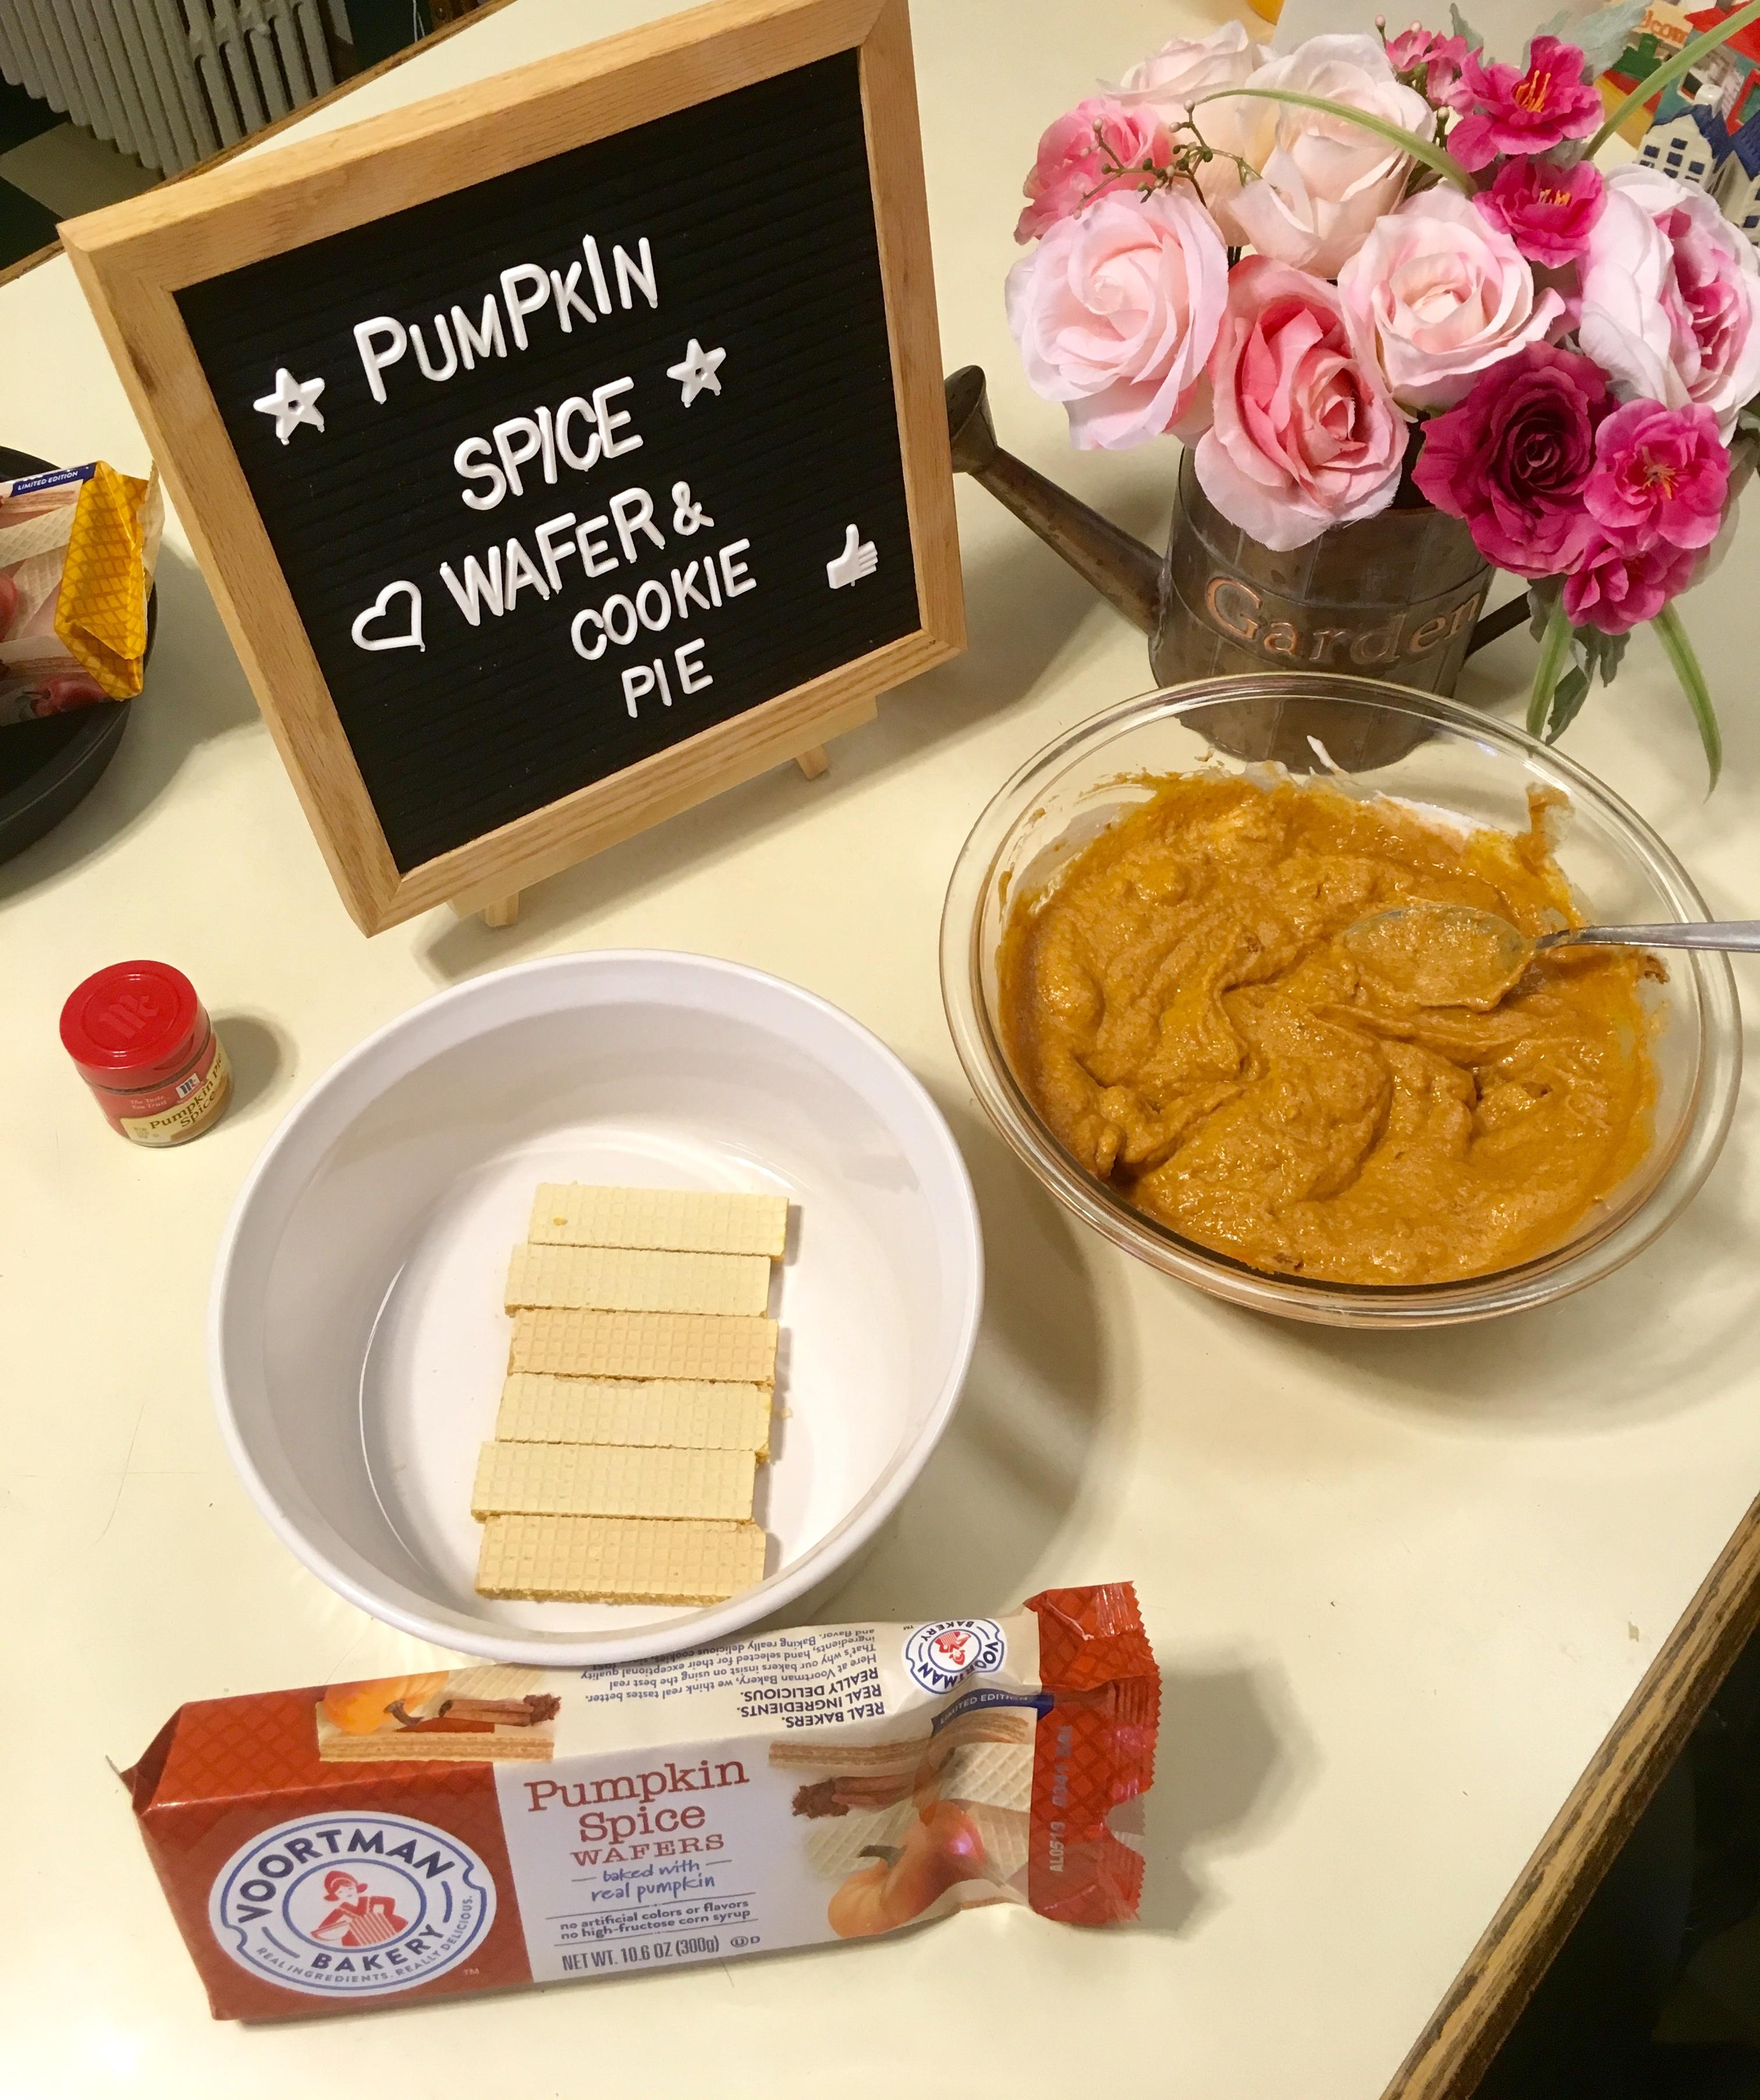 No Bake Pumpkin Spice Wafer and Cookie Pie